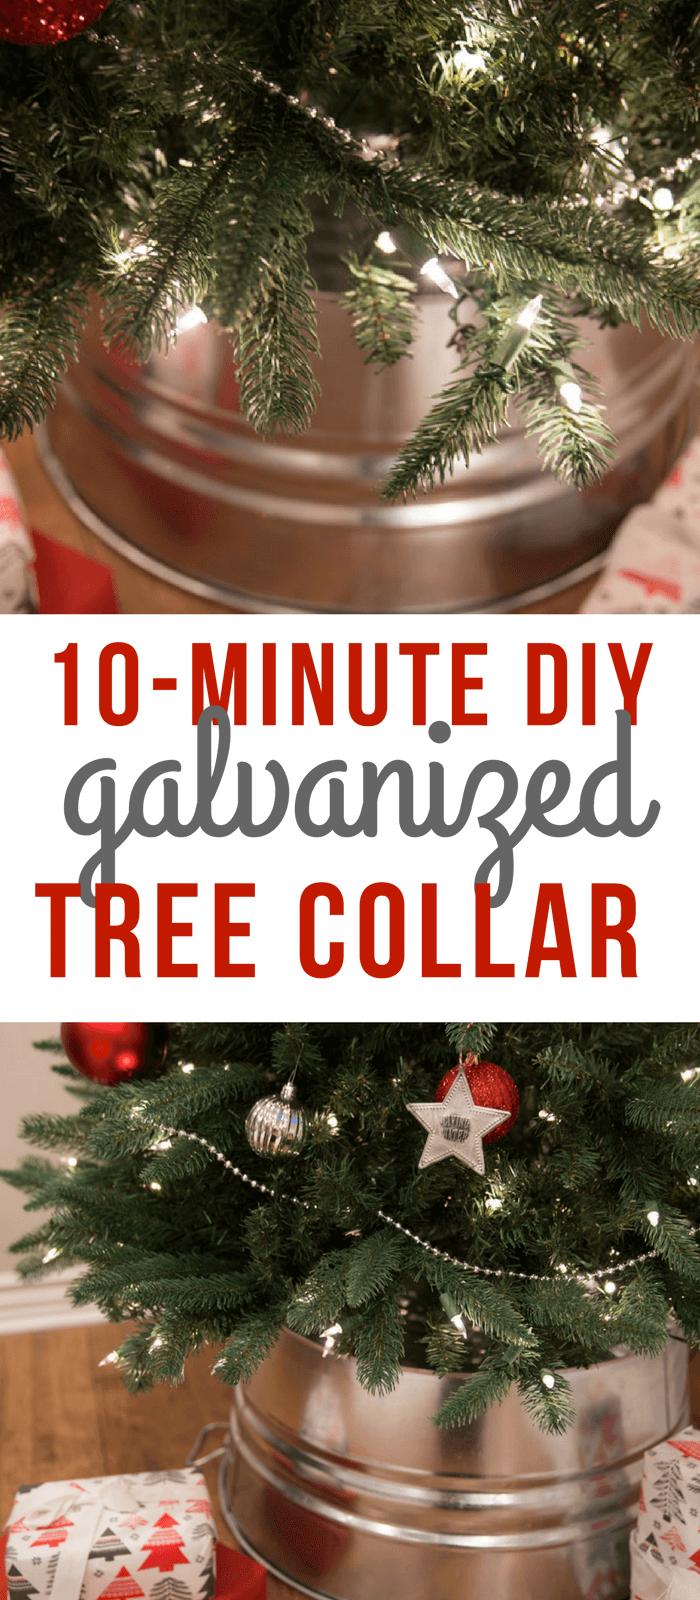 6 Best Galvanized Tree Collars Plus Diy Option Sofestive Com Cheap Christmas Trees Simple Christmas Tree Tree Collar Christmas